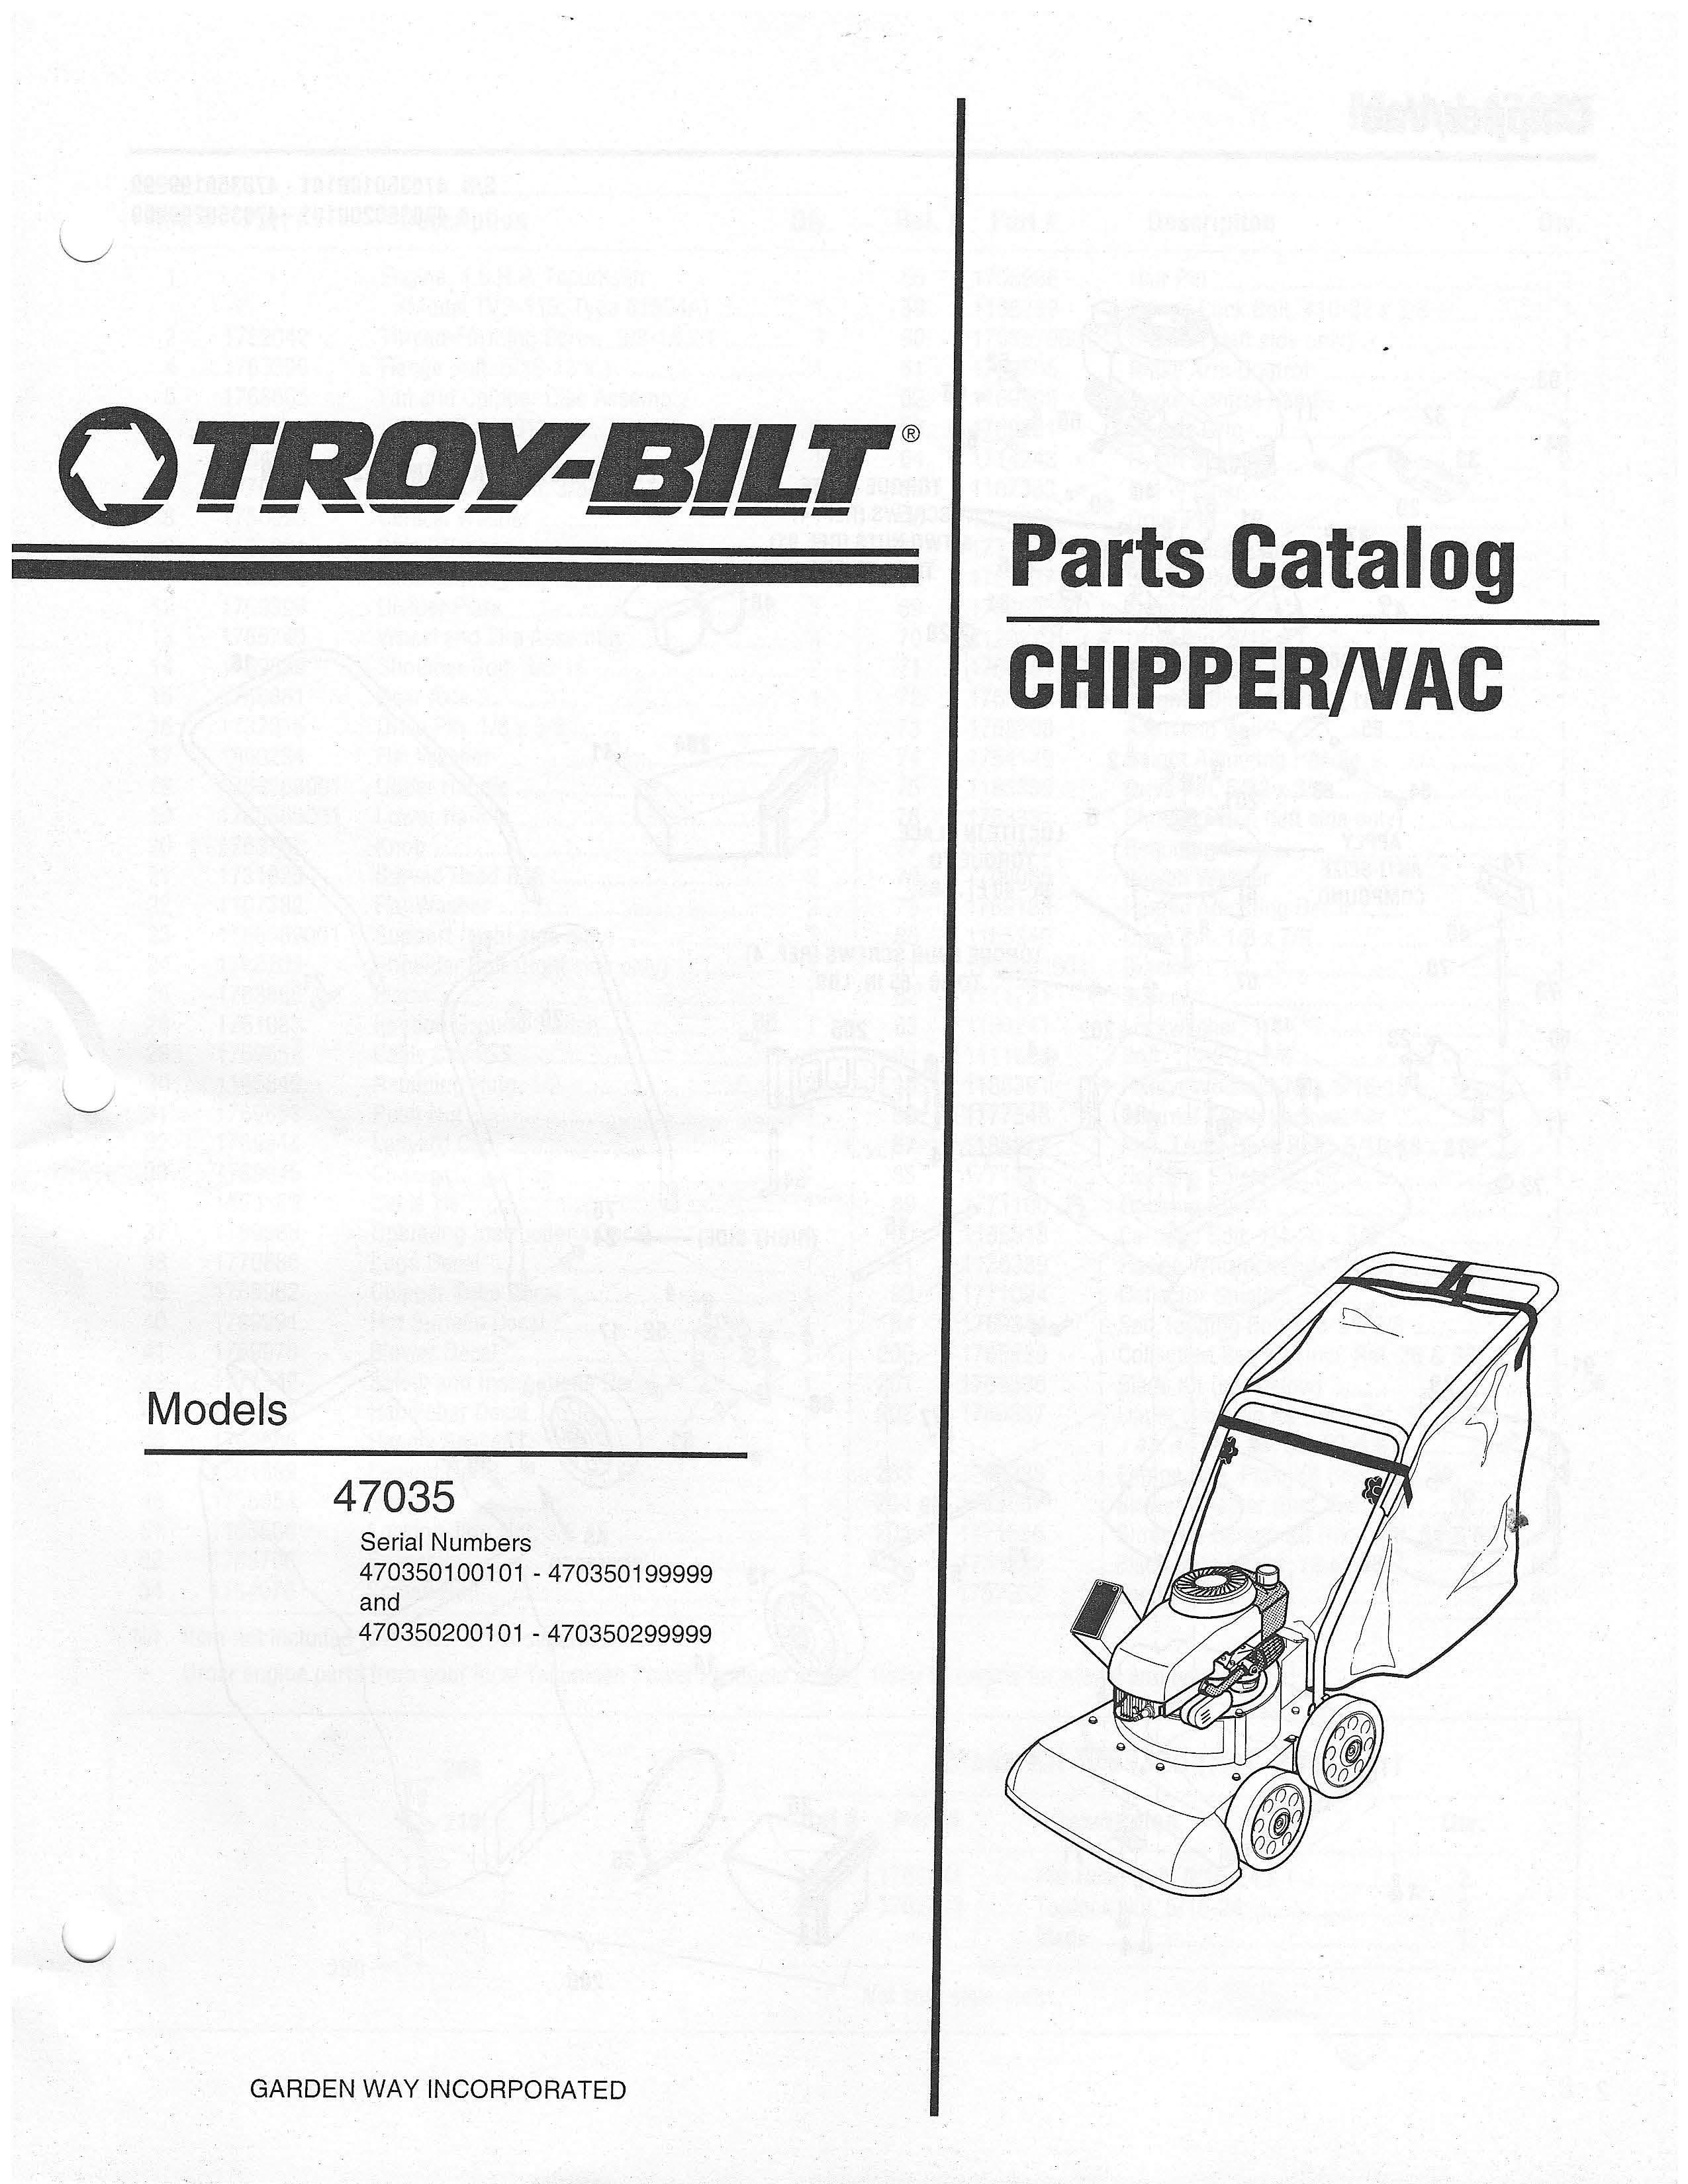 Troy bilt 47321 parts jonathan steele chipper shredder manuals fandeluxe Images